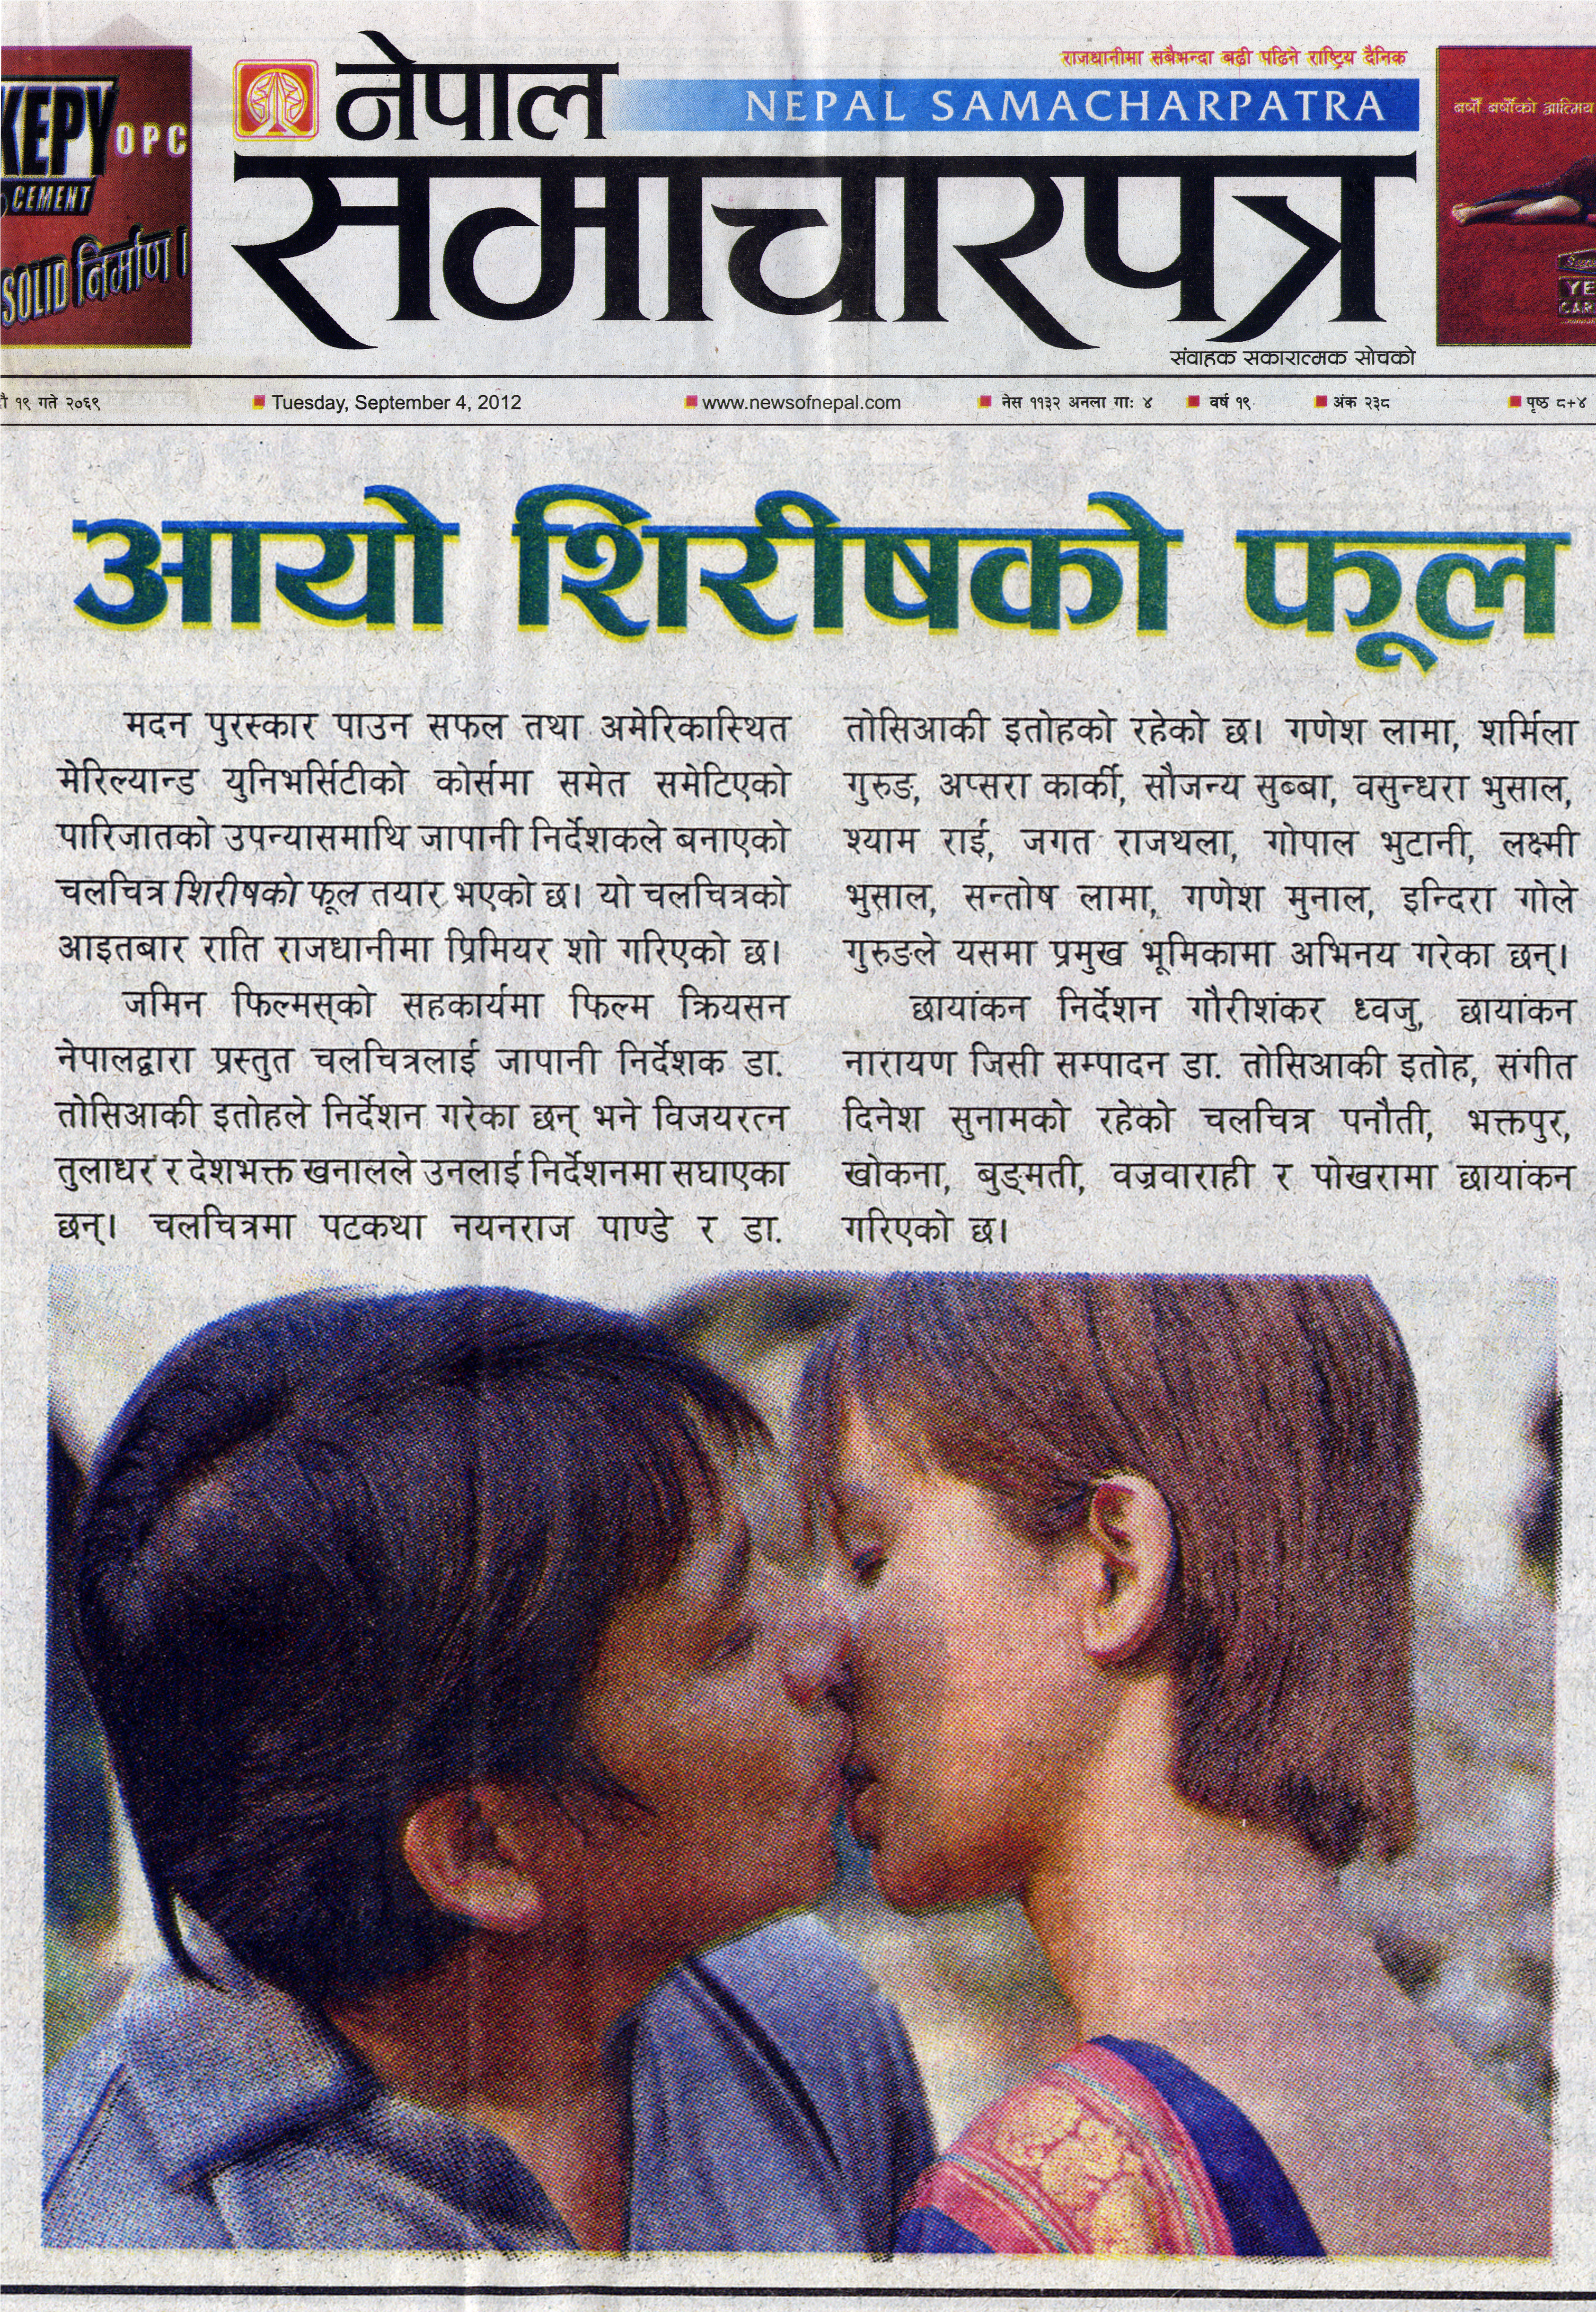 samachar patra Newspapers in nepal kantipur daily the himalayan times nagarik dainik  annapurna post daily nepal samachar patra rajdhani the rising nepal.